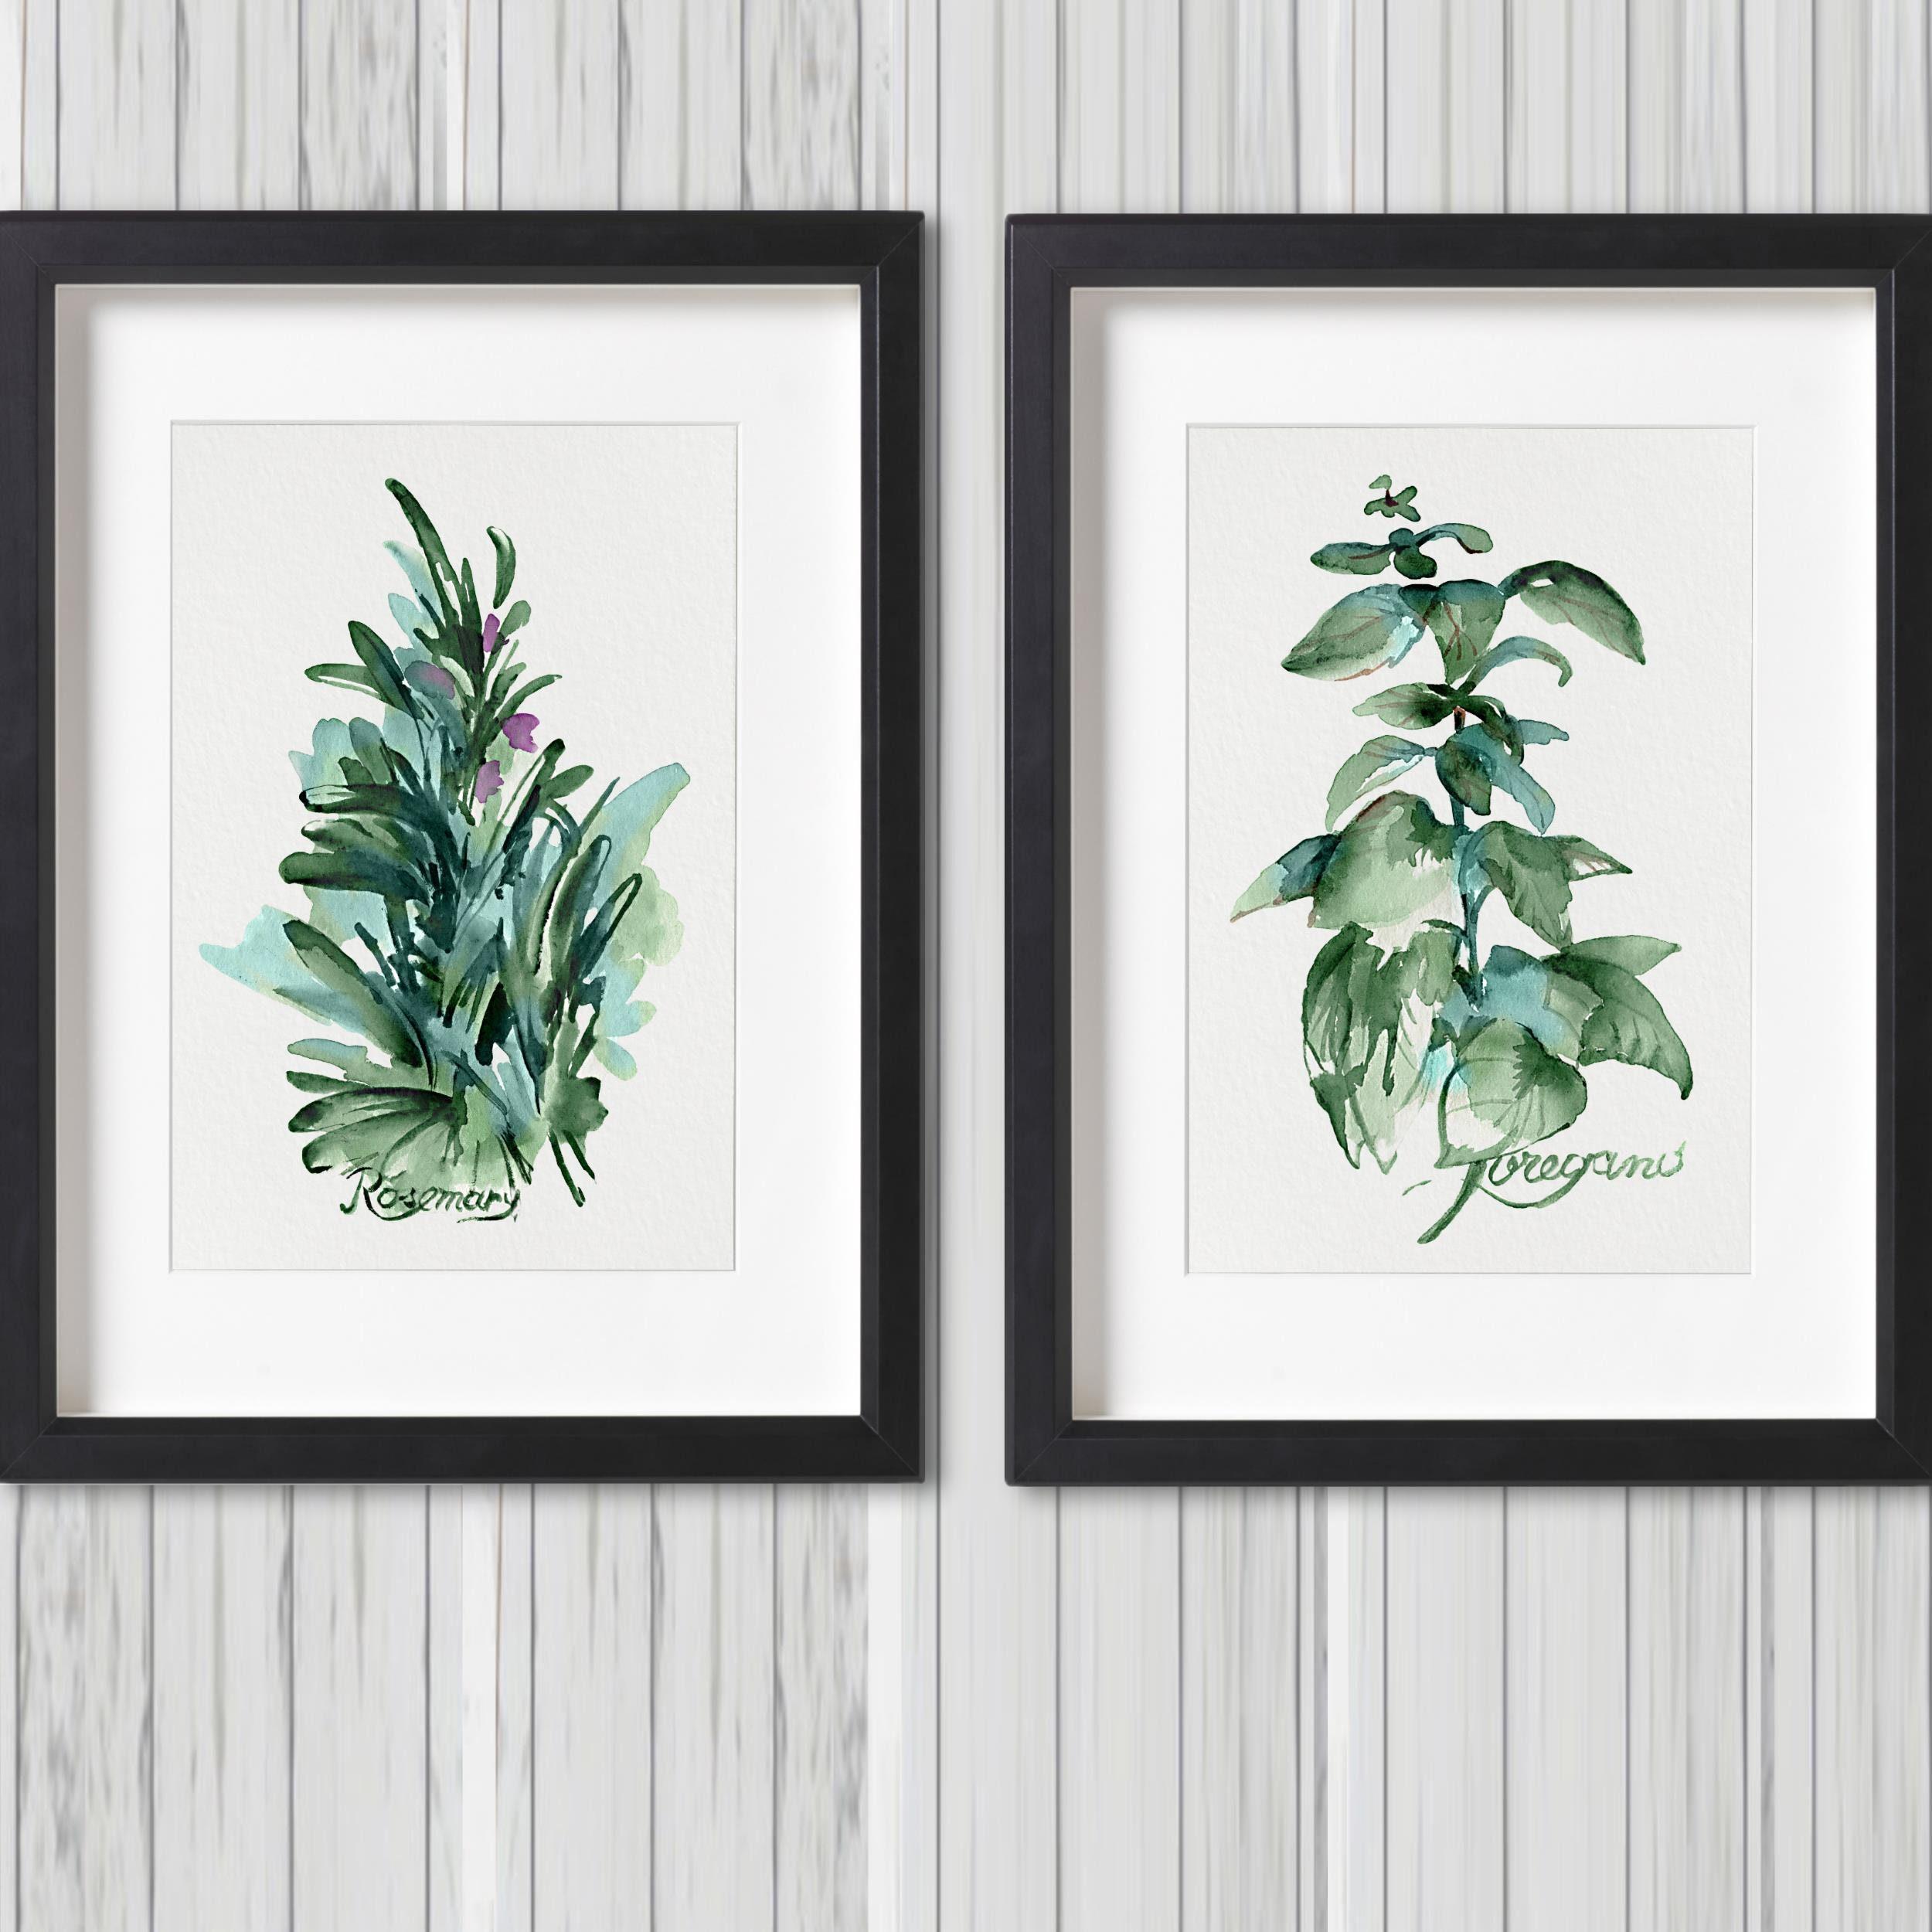 Kitchen Herbs Set 2 Art Prints Herb Painting Green Leaves